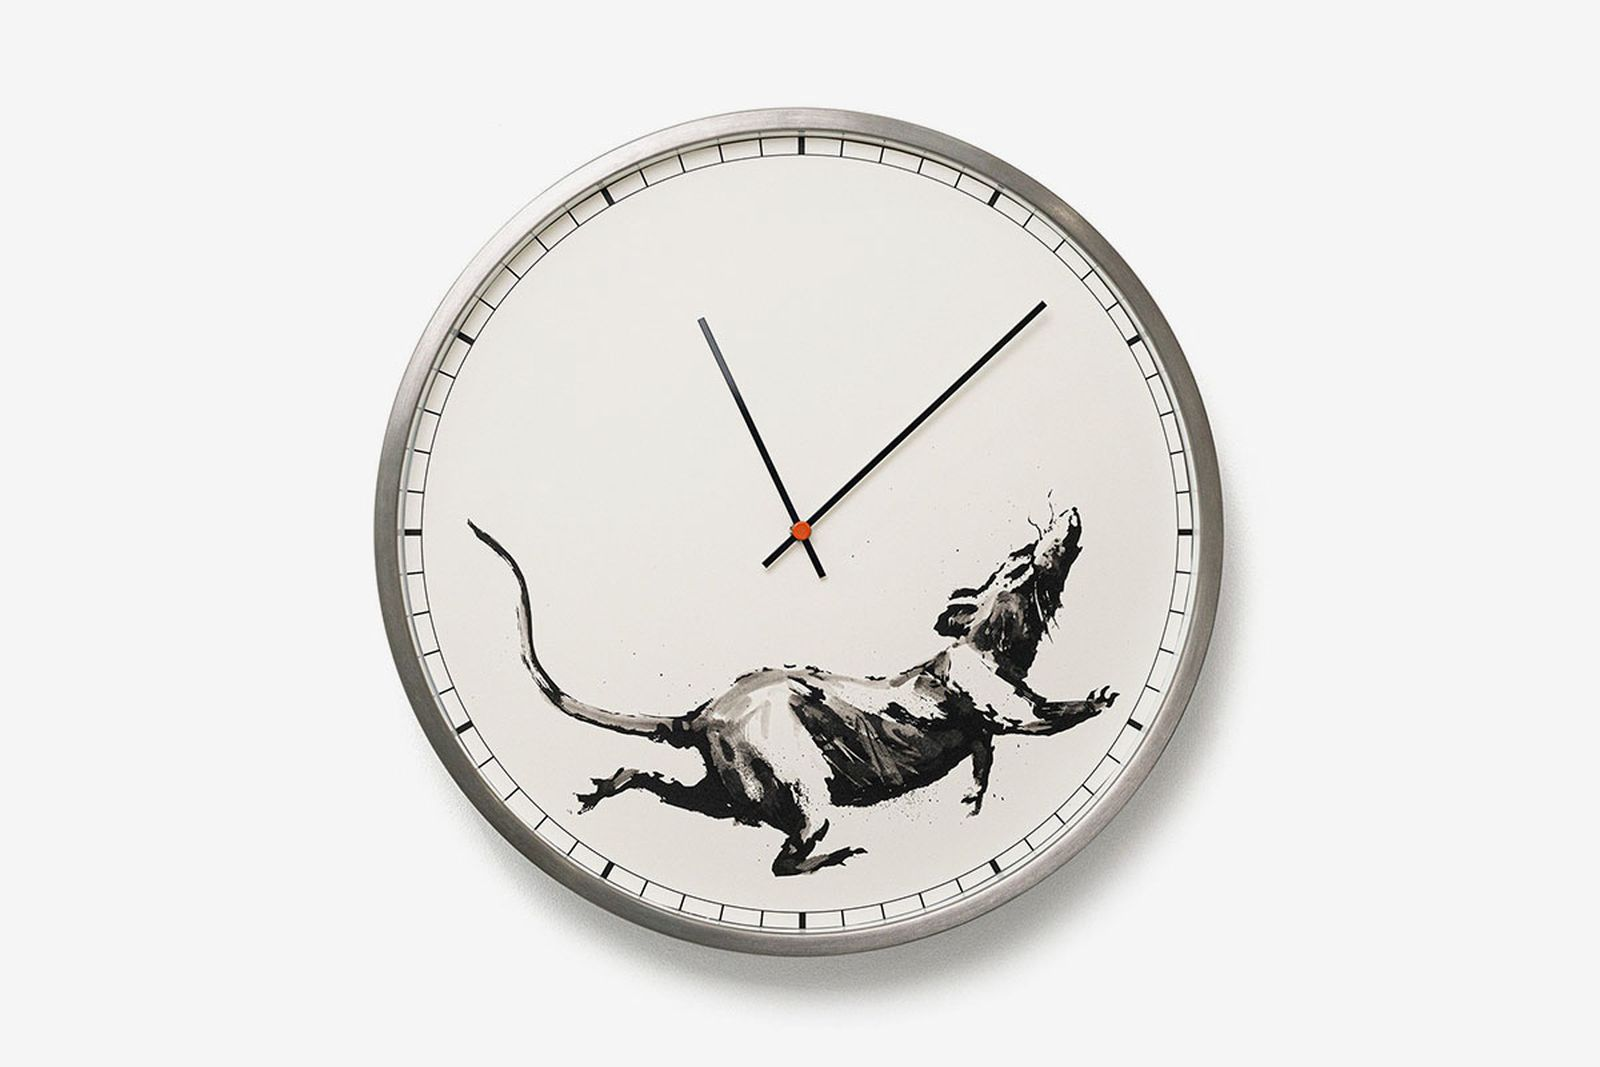 Banksy Gross Domestic Product clock